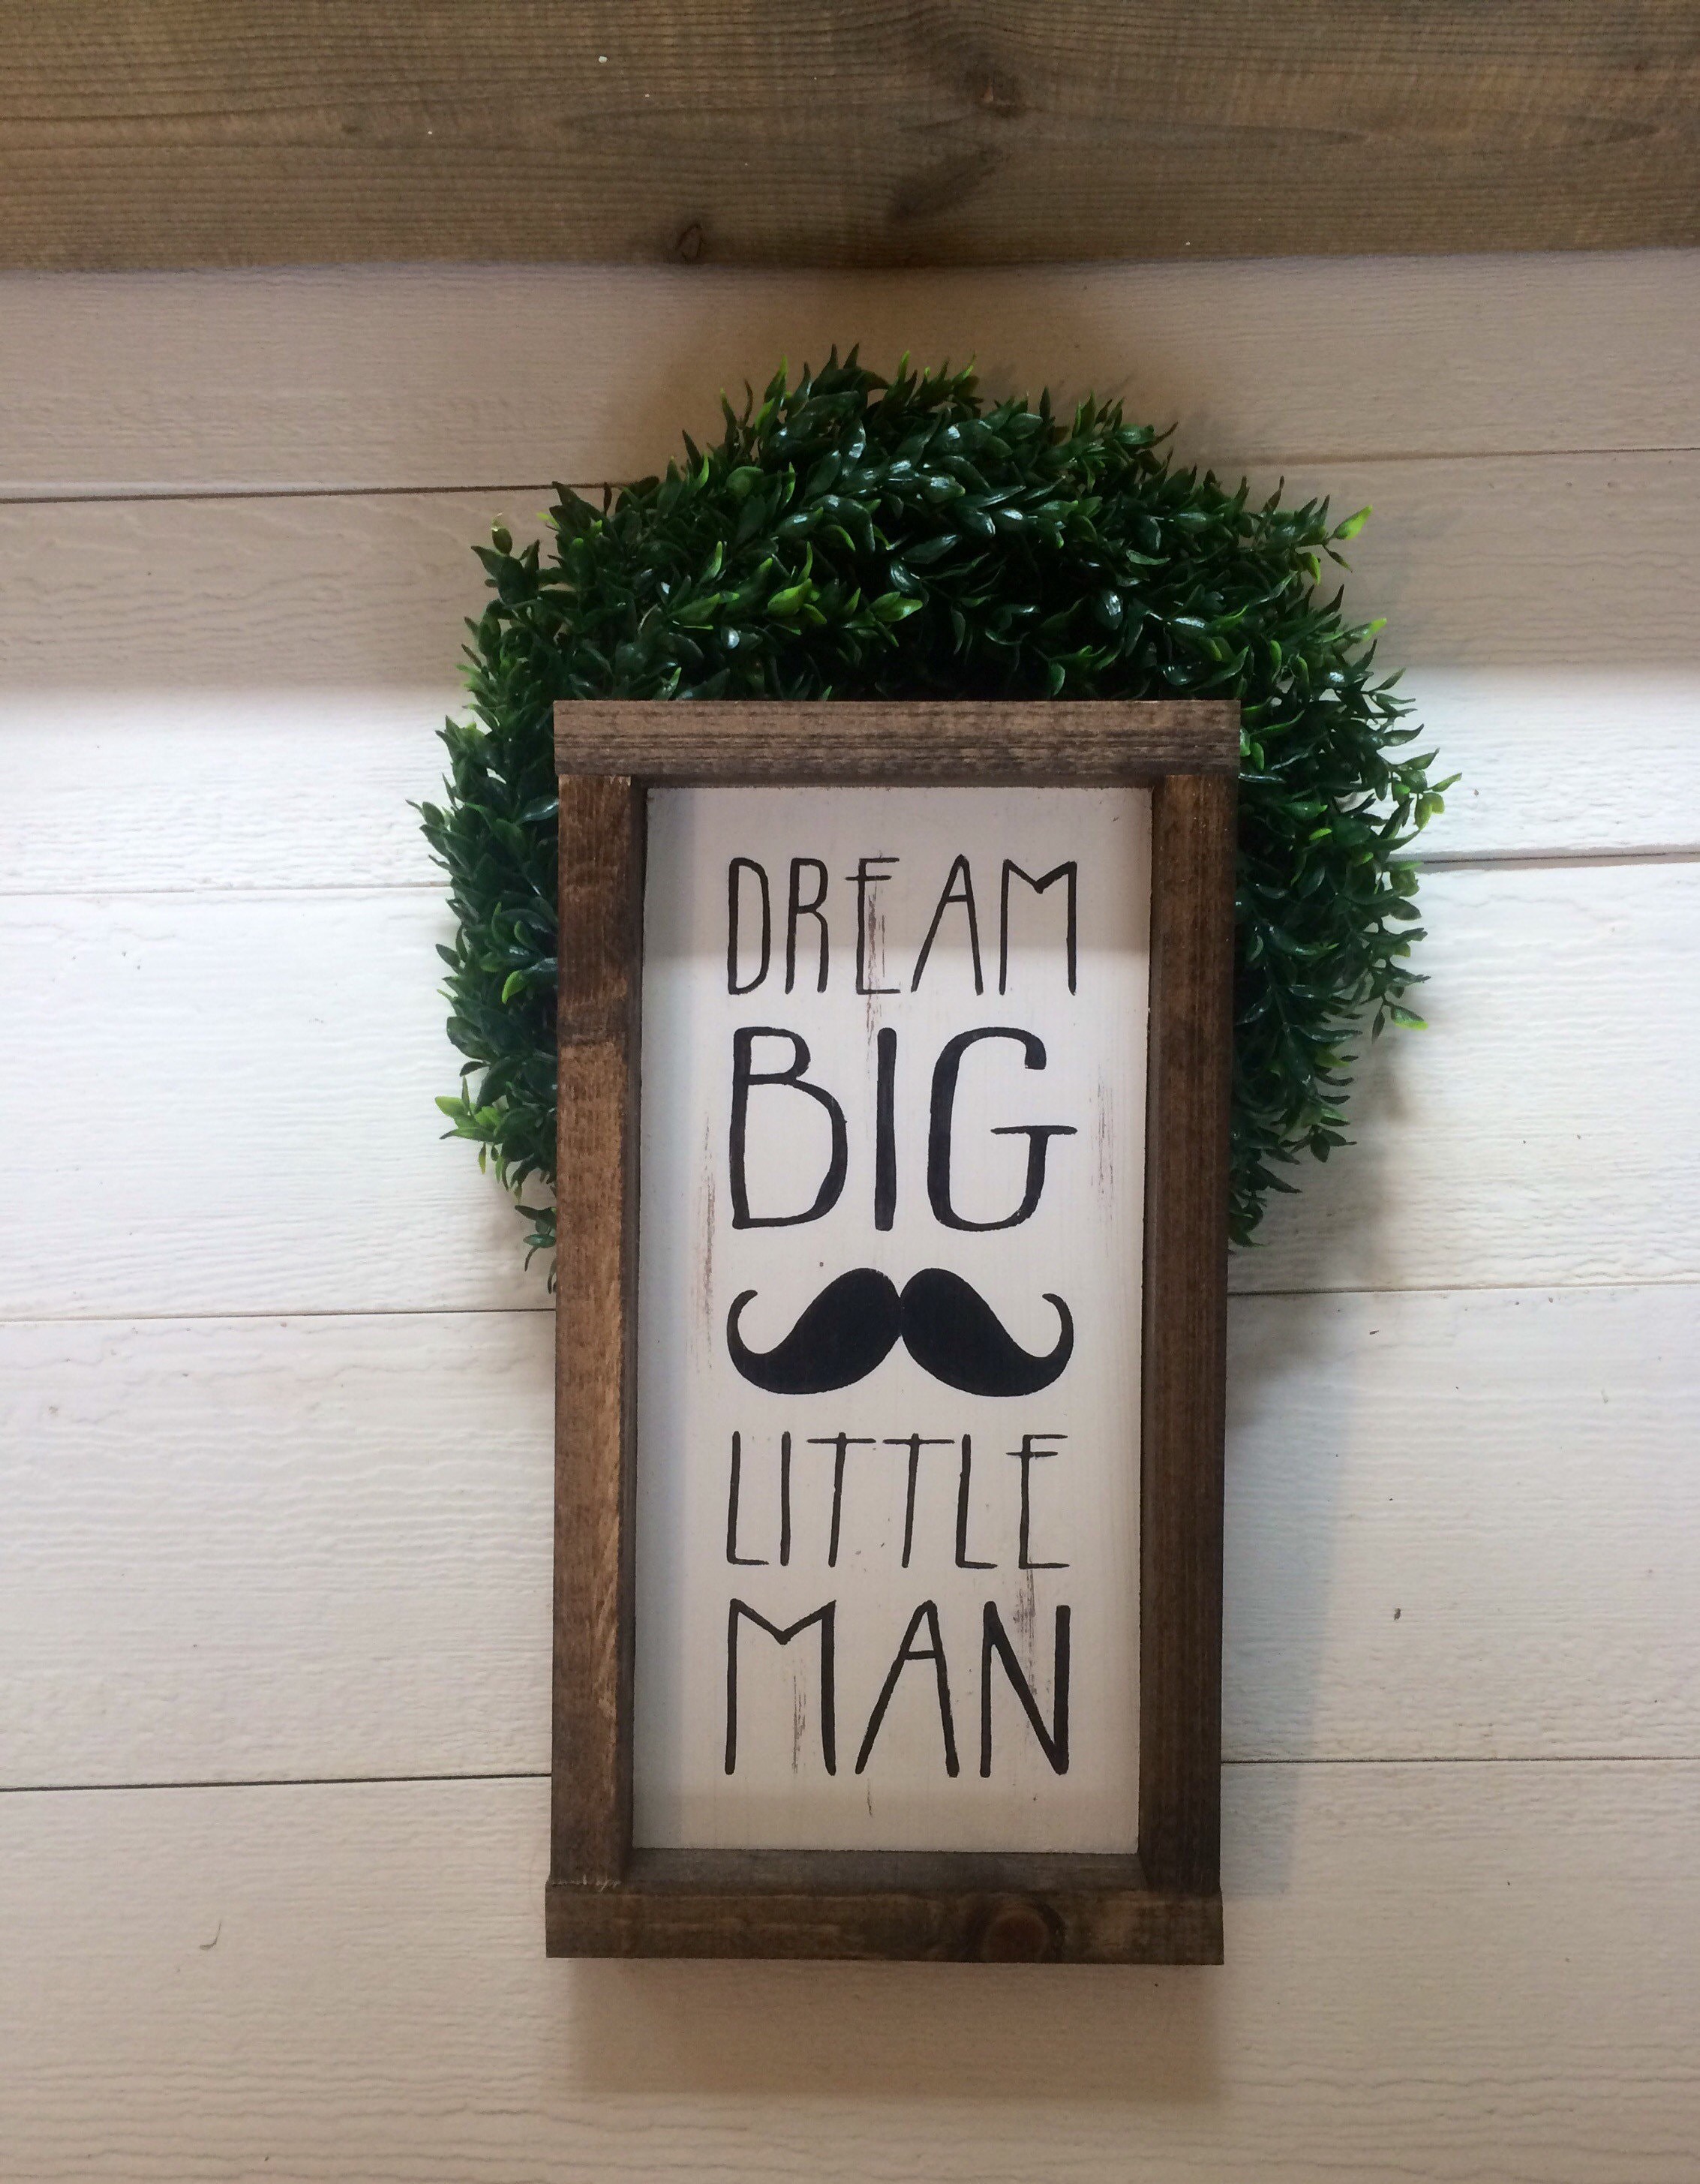 Dream Big Little Man Wood Framed Sign Baby Nursery Decor